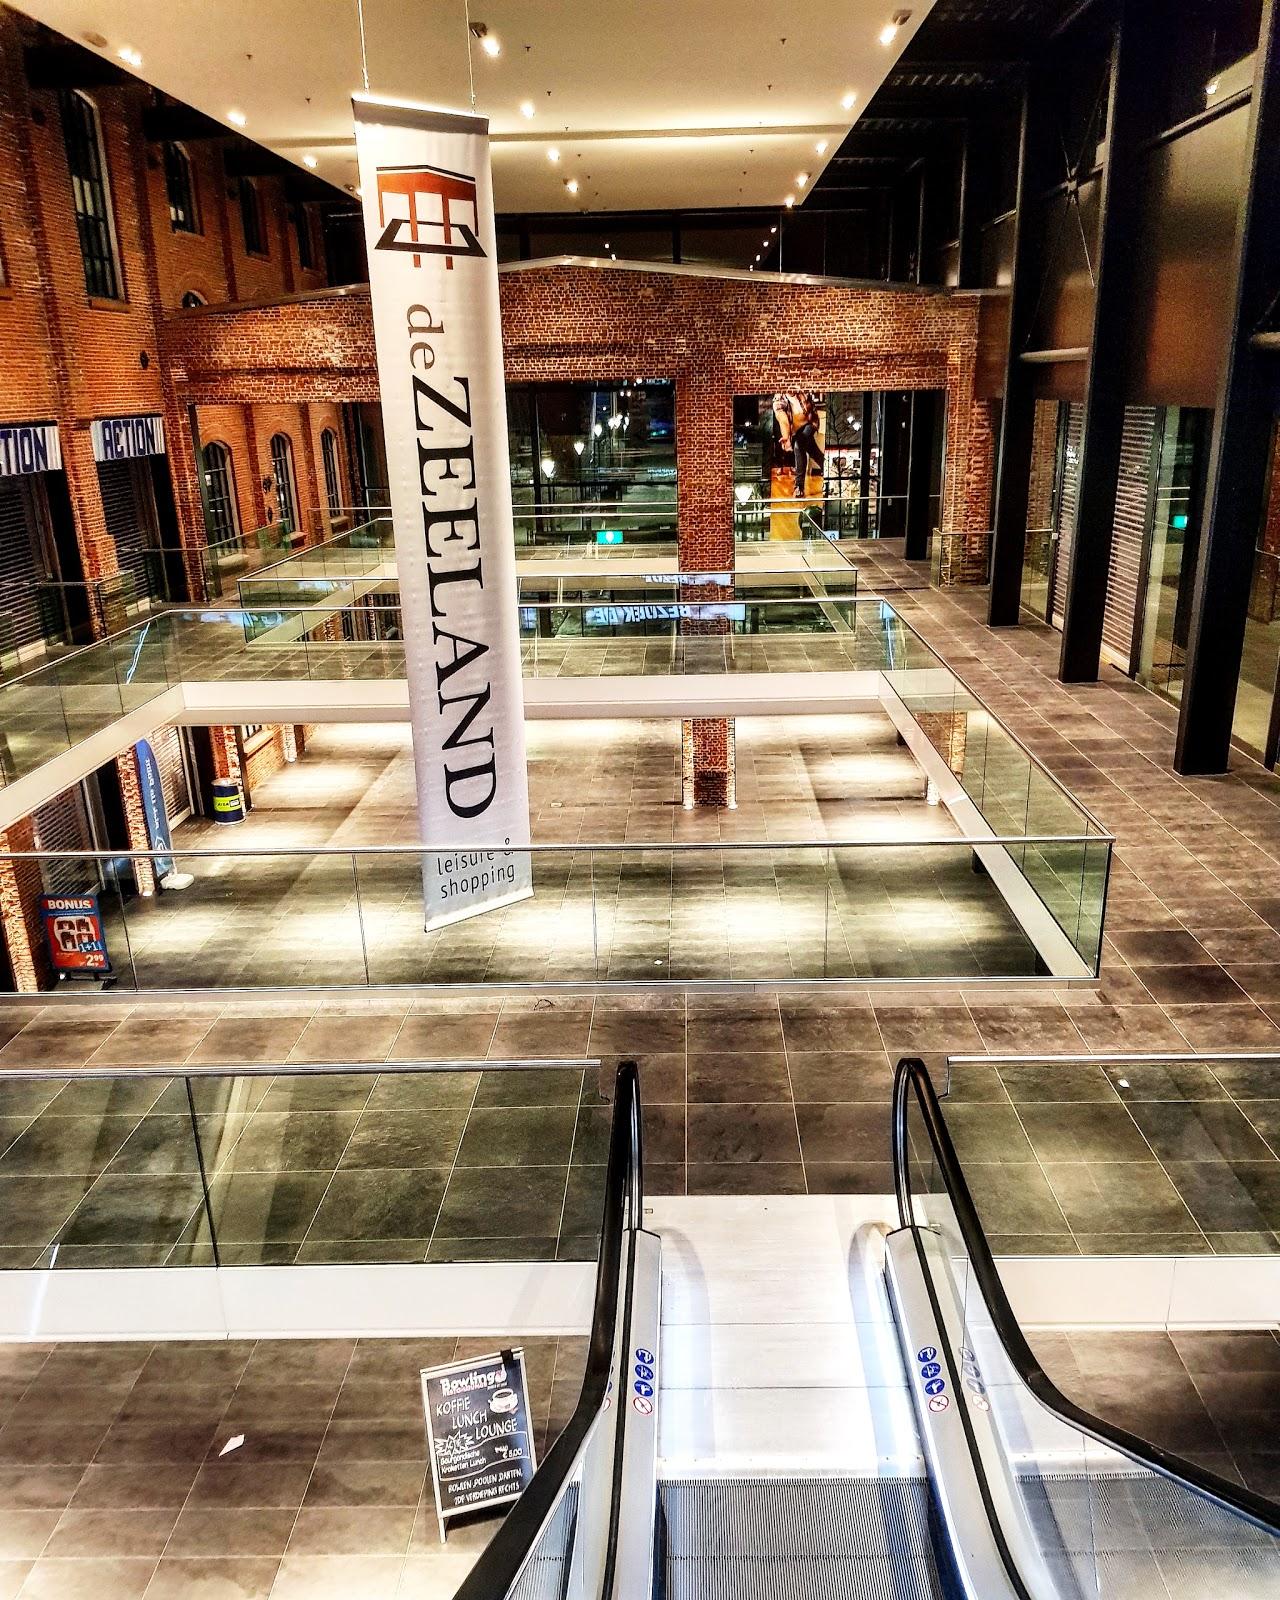 Winkelcentra Zeeland